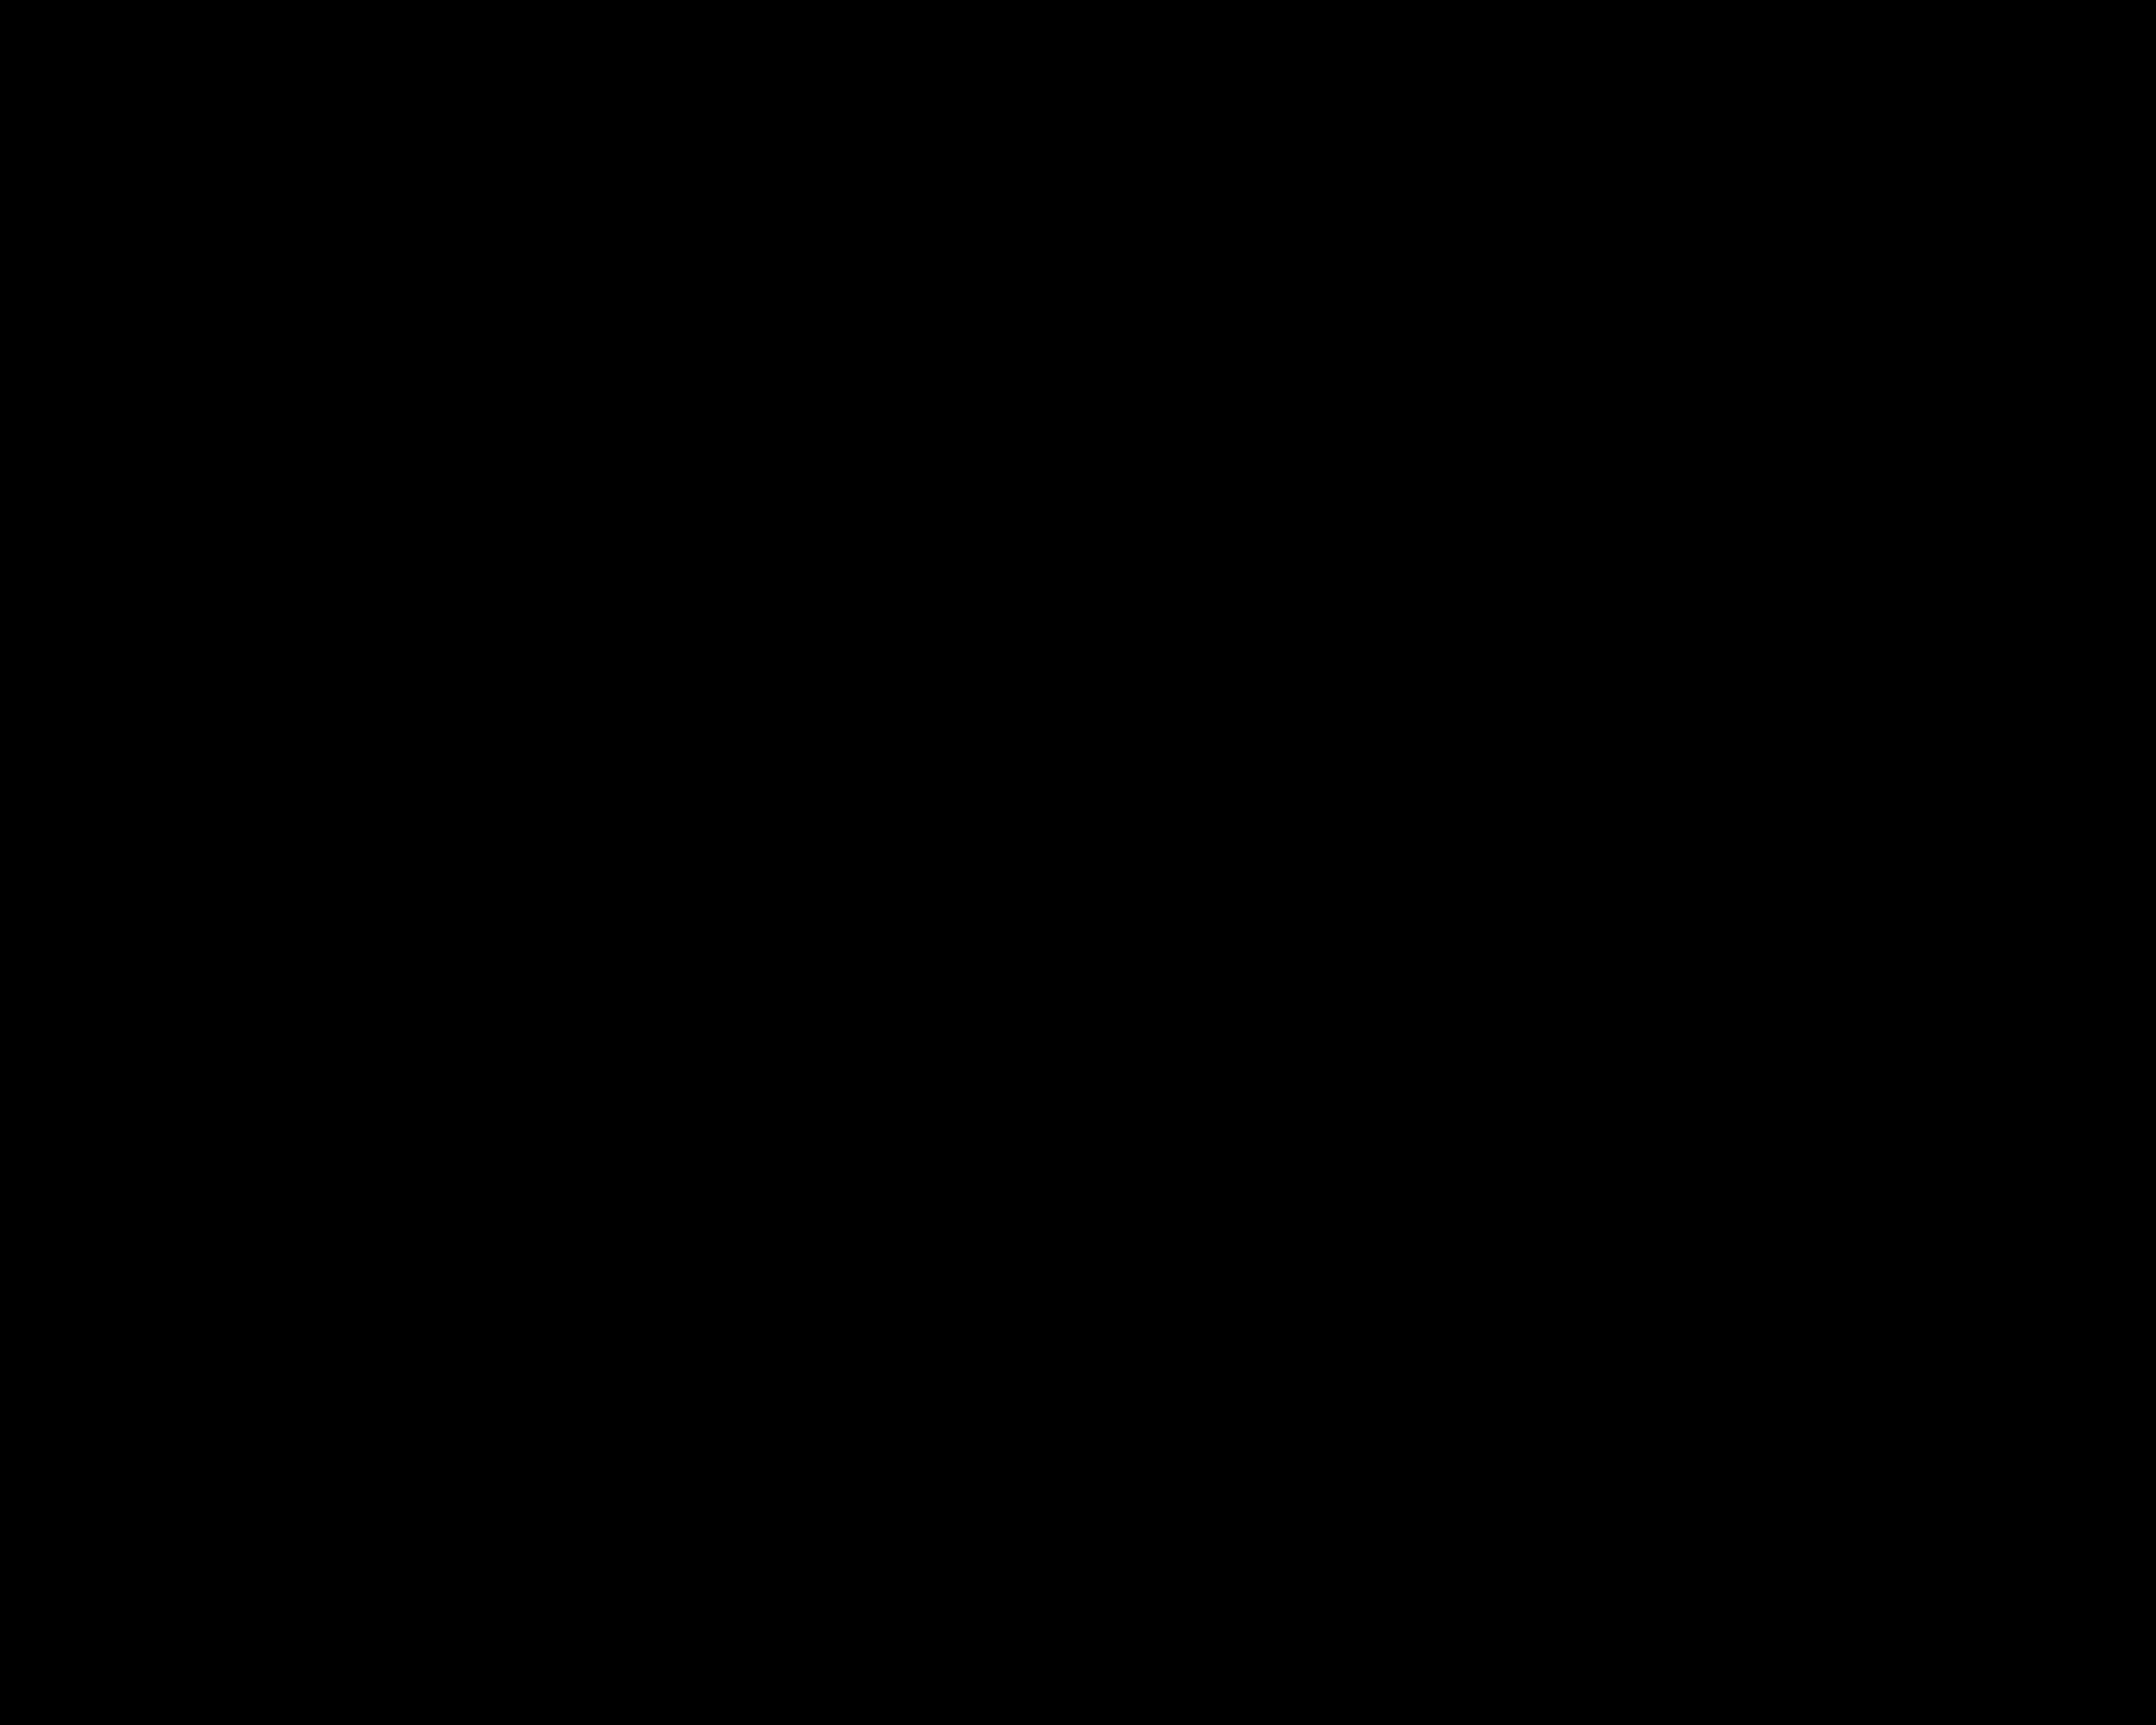 2400x1920 Clipart